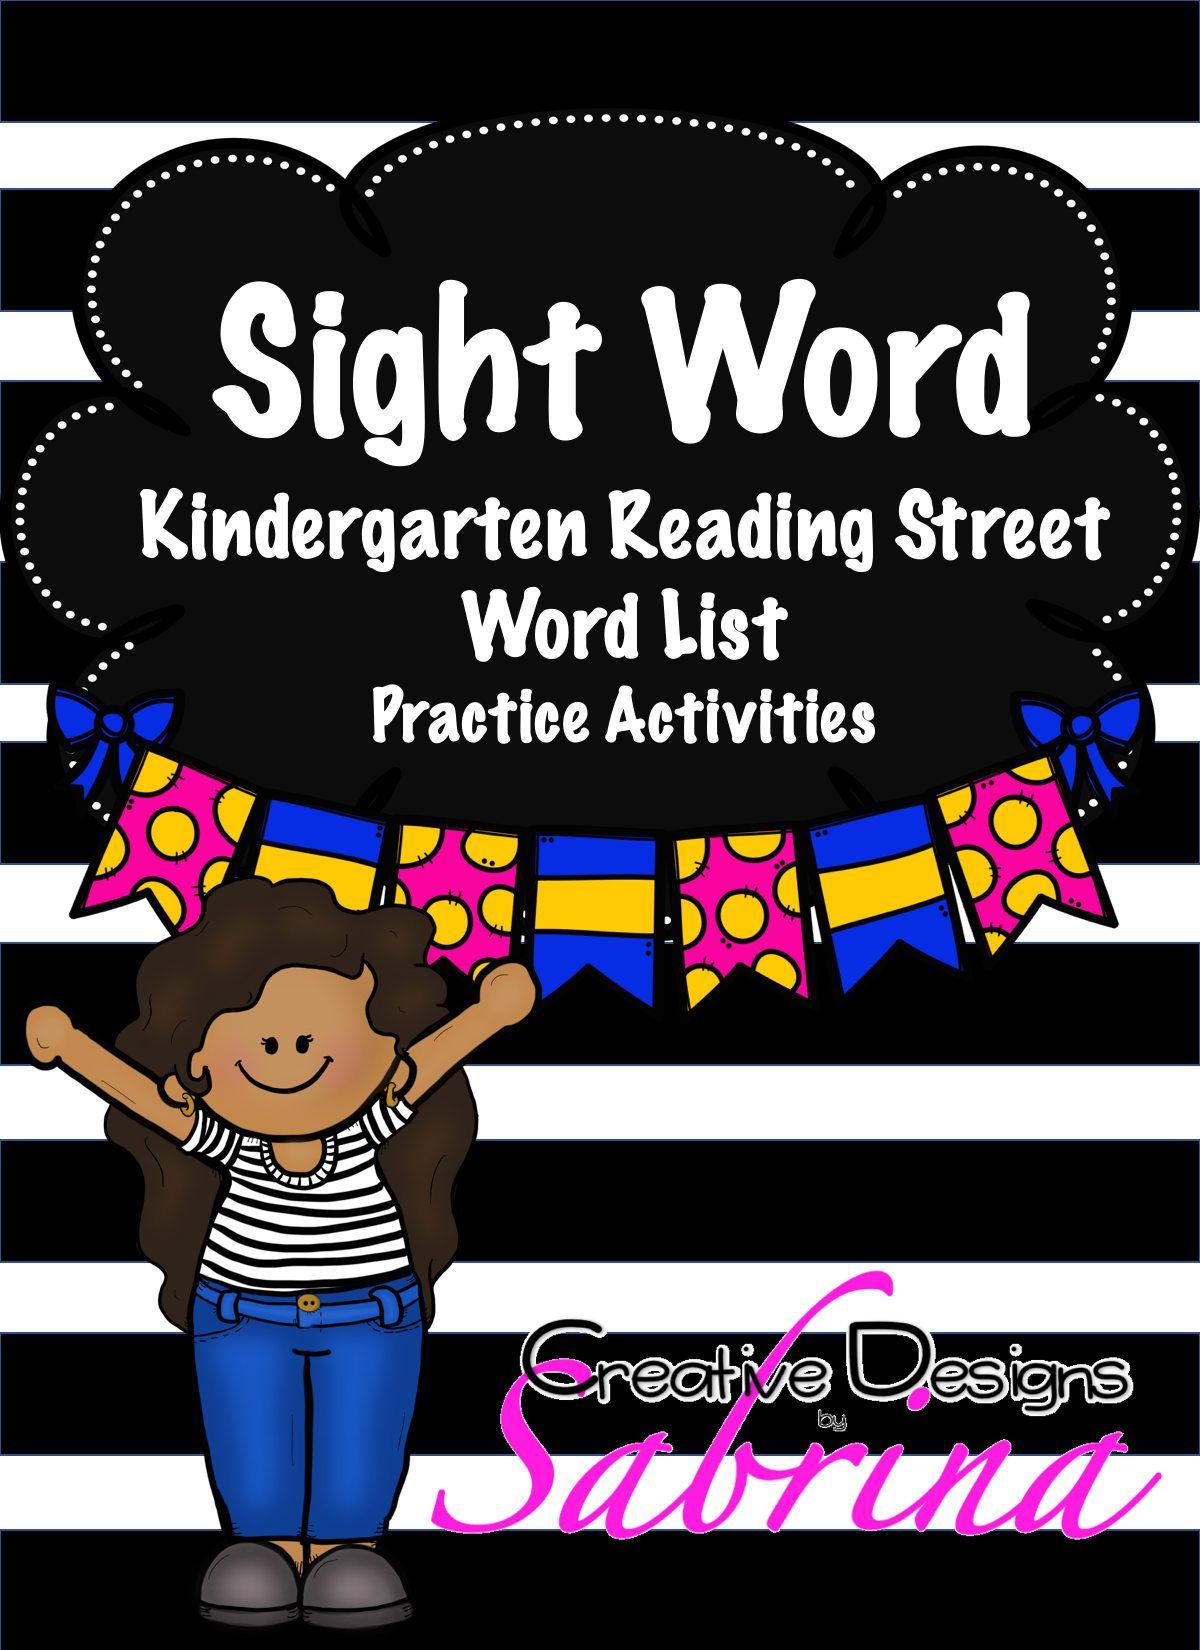 Sight Word Center Pack Kindergarten Reading Street Word